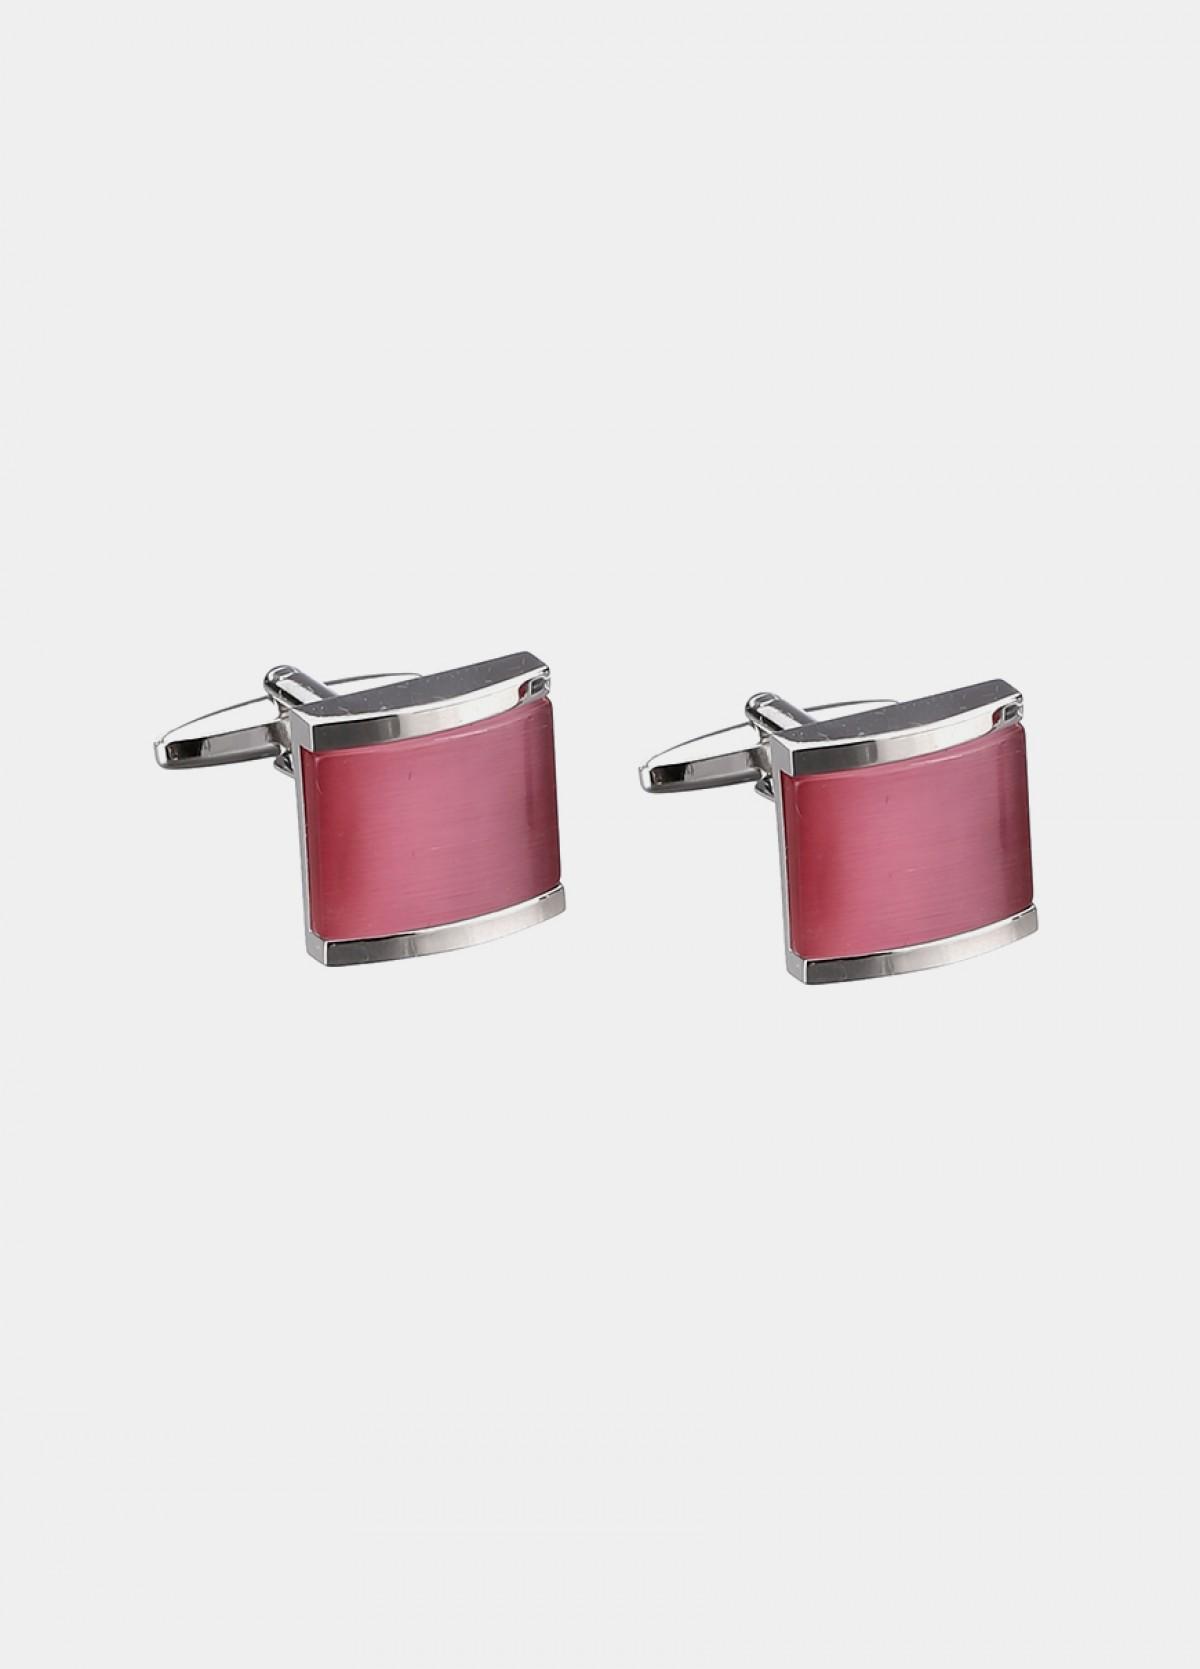 The Nickel Shiny Metal Cufflinks